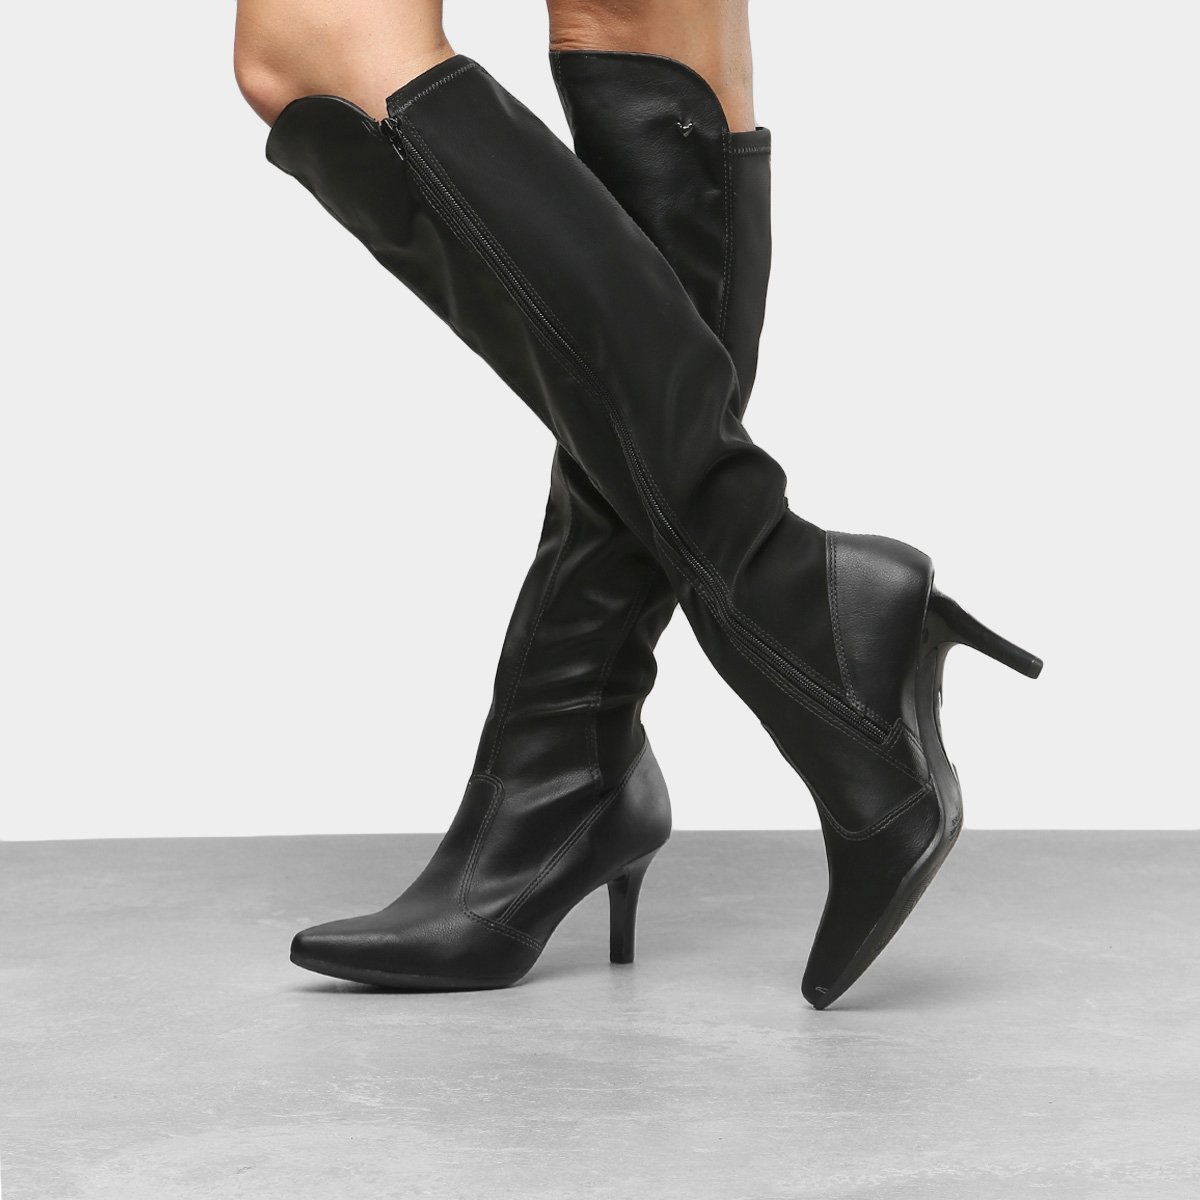 c1504062e Bota Over the Knee Mississipi Bico Fino Feminina | Opte+